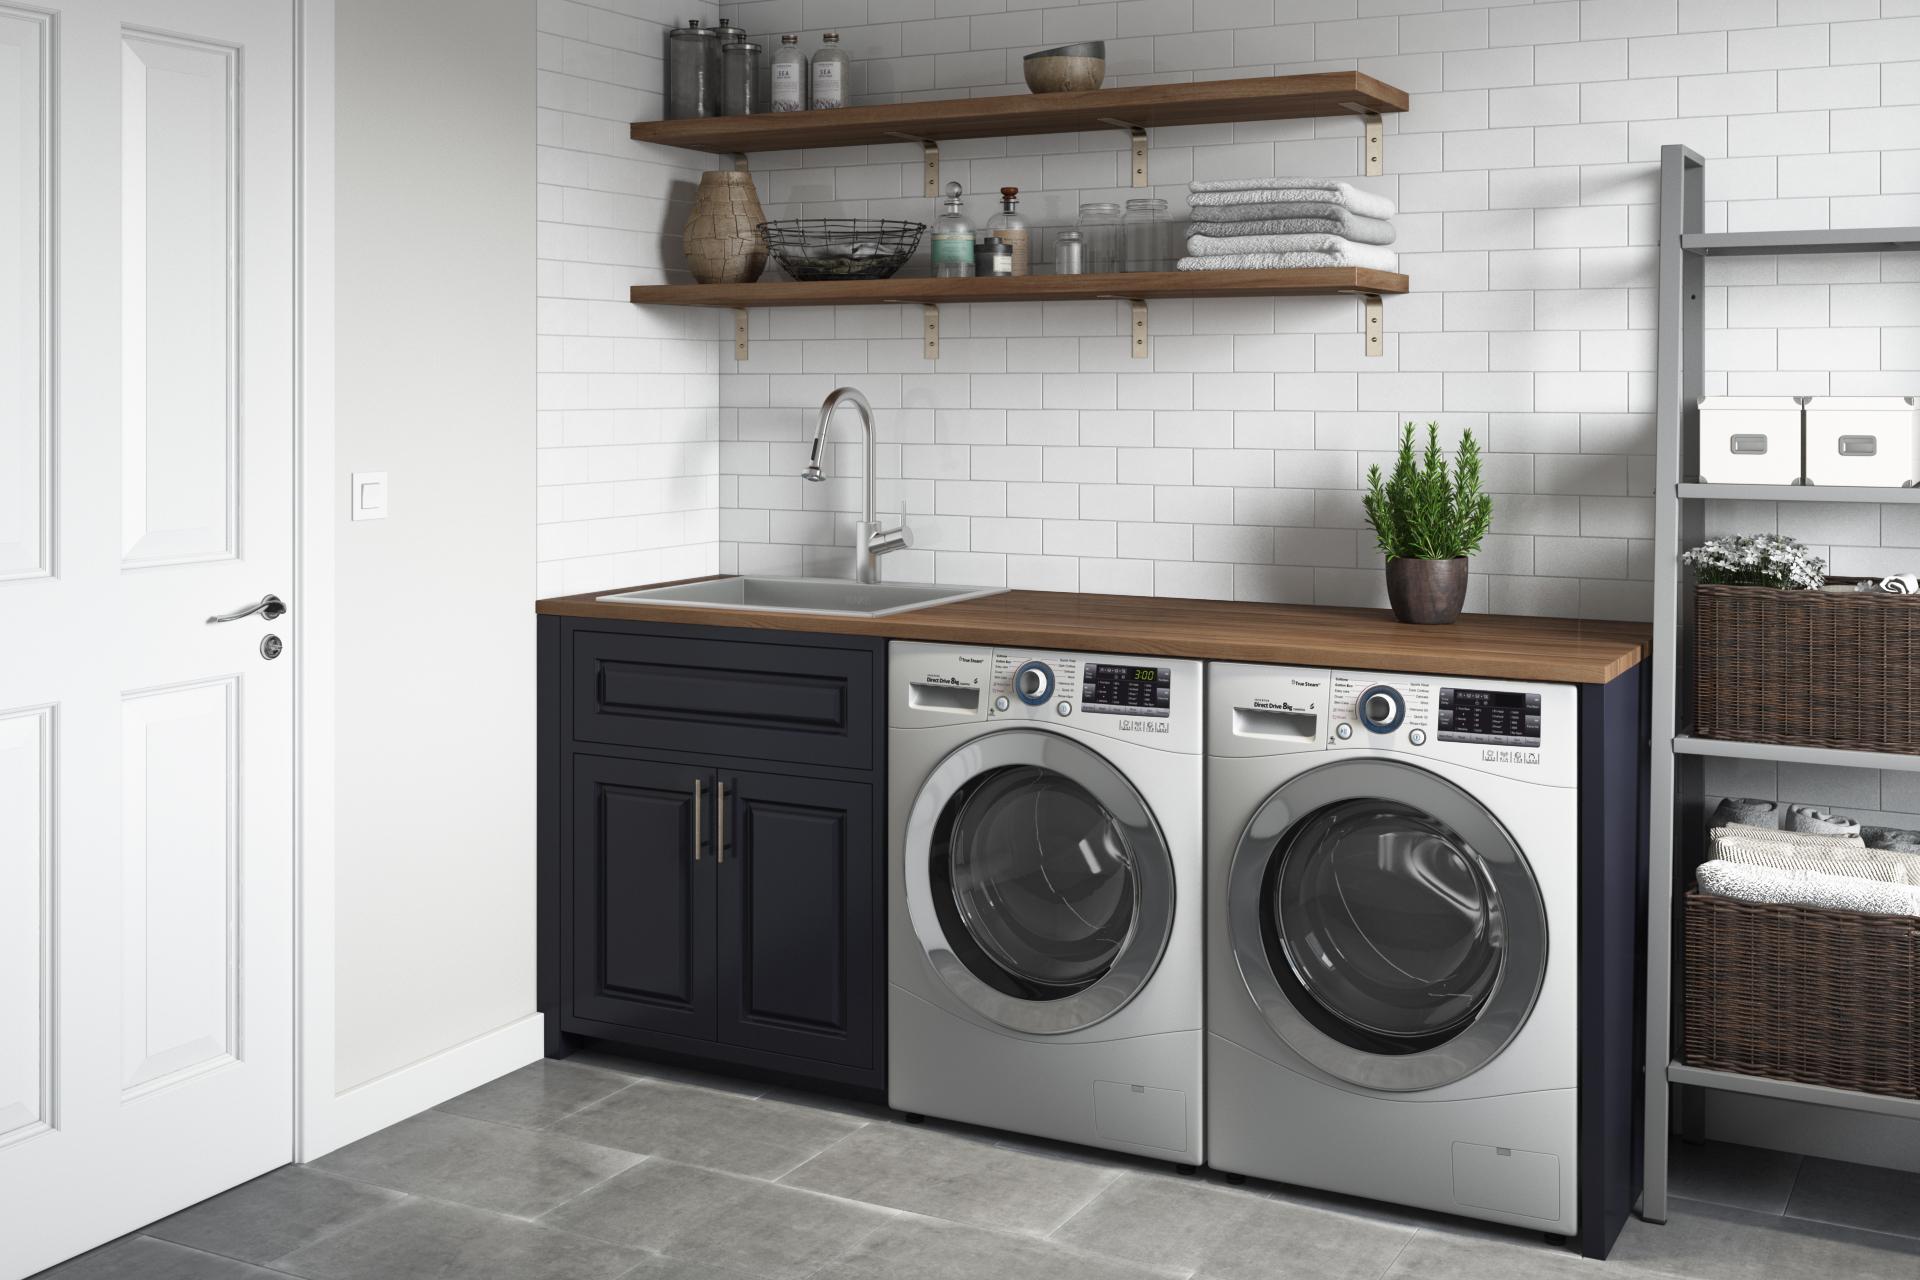 topmount laundry 22 x 22 x 12 deep